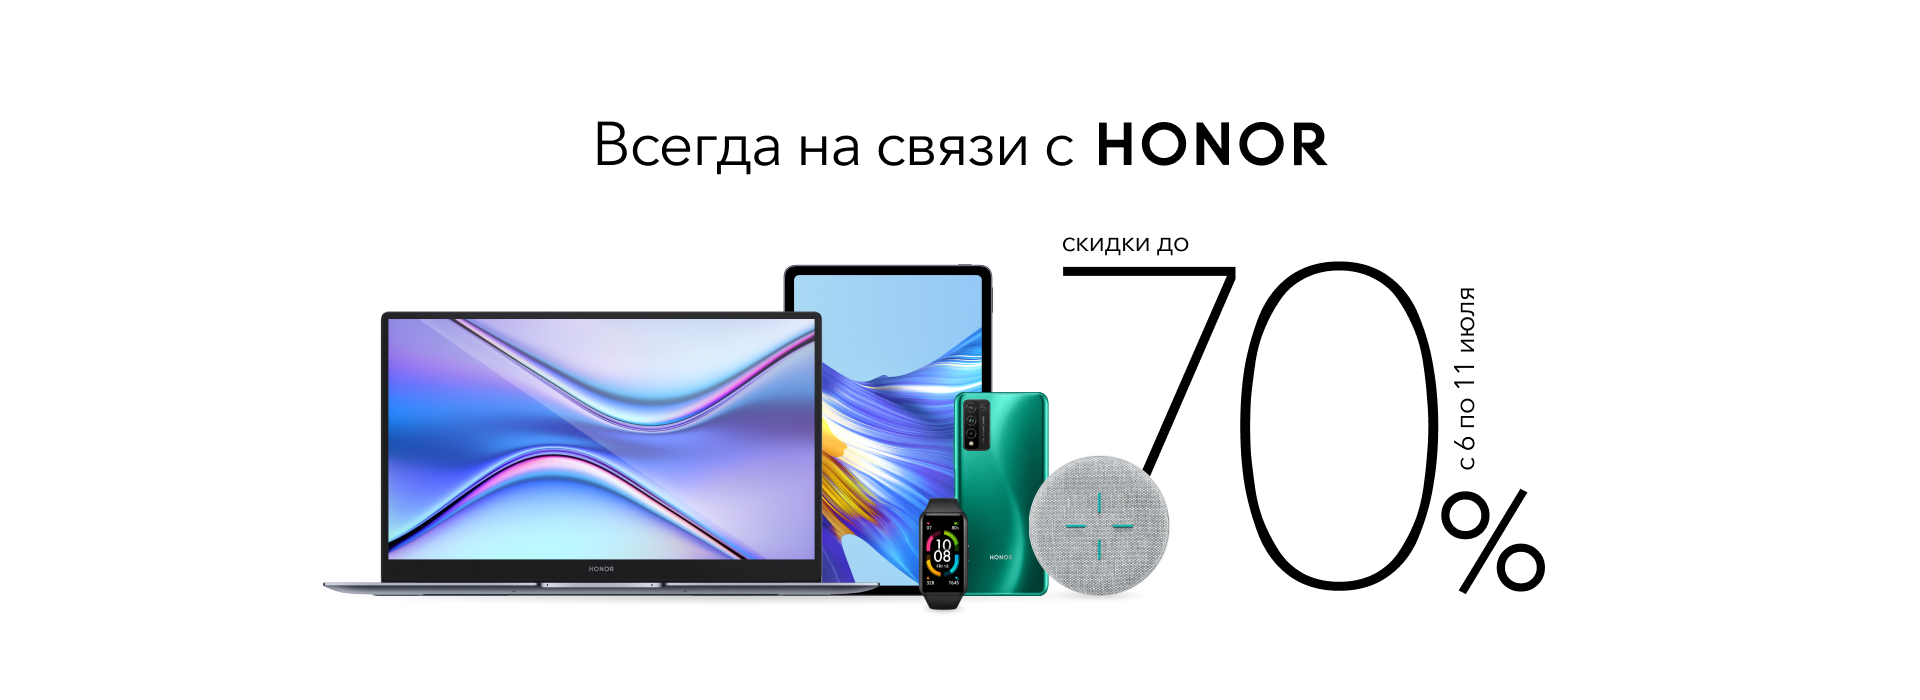 Honor снизил цены на ноутбуки и аксессуары